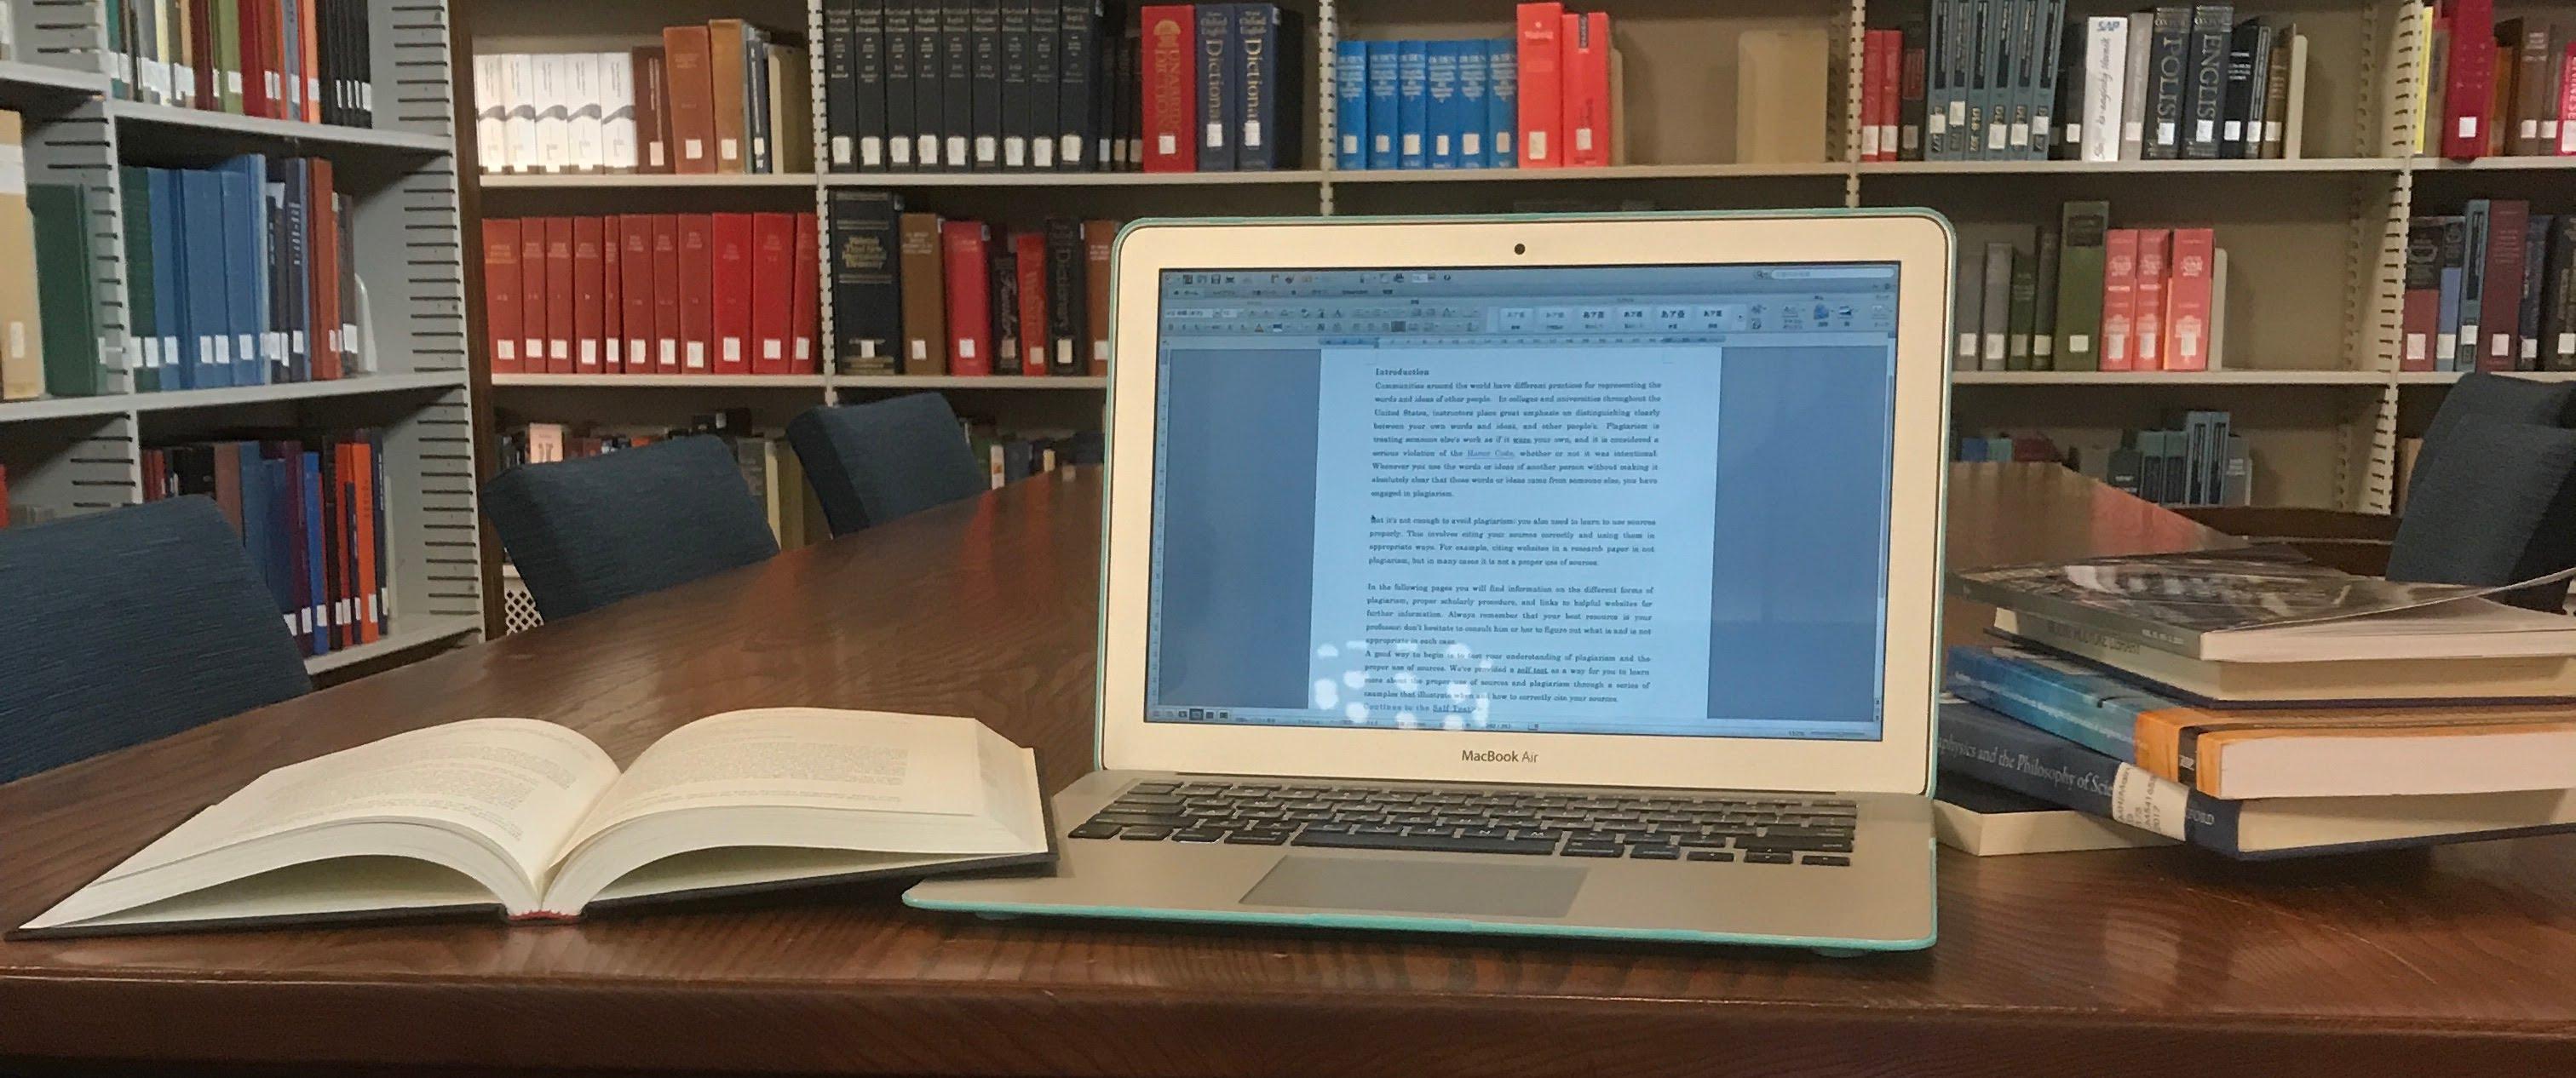 Image: Books, laptop